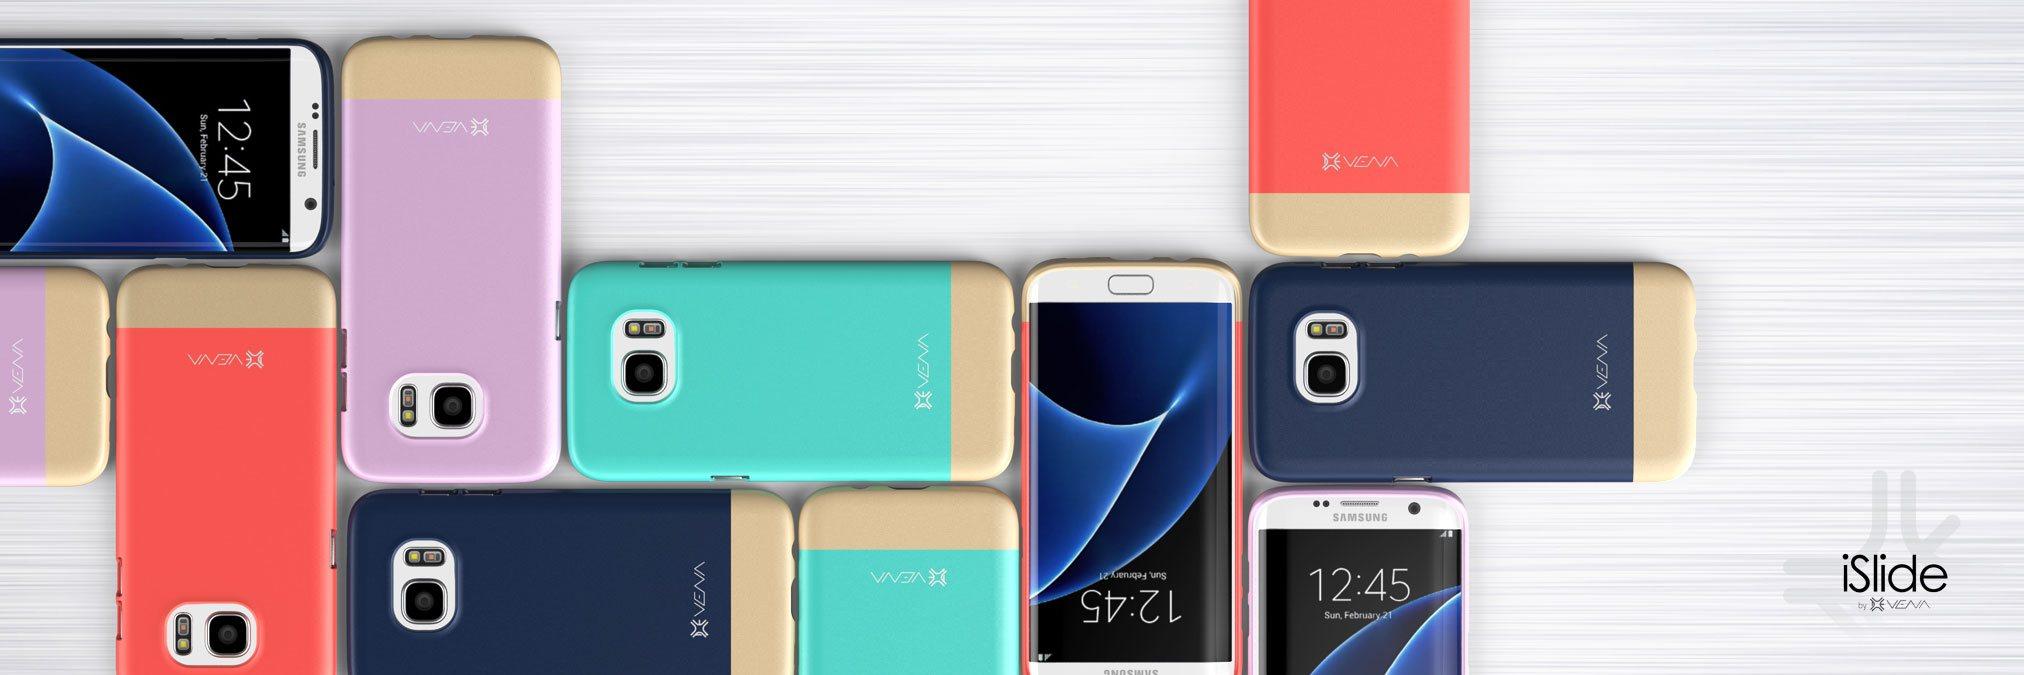 iSlide Galaxy S7